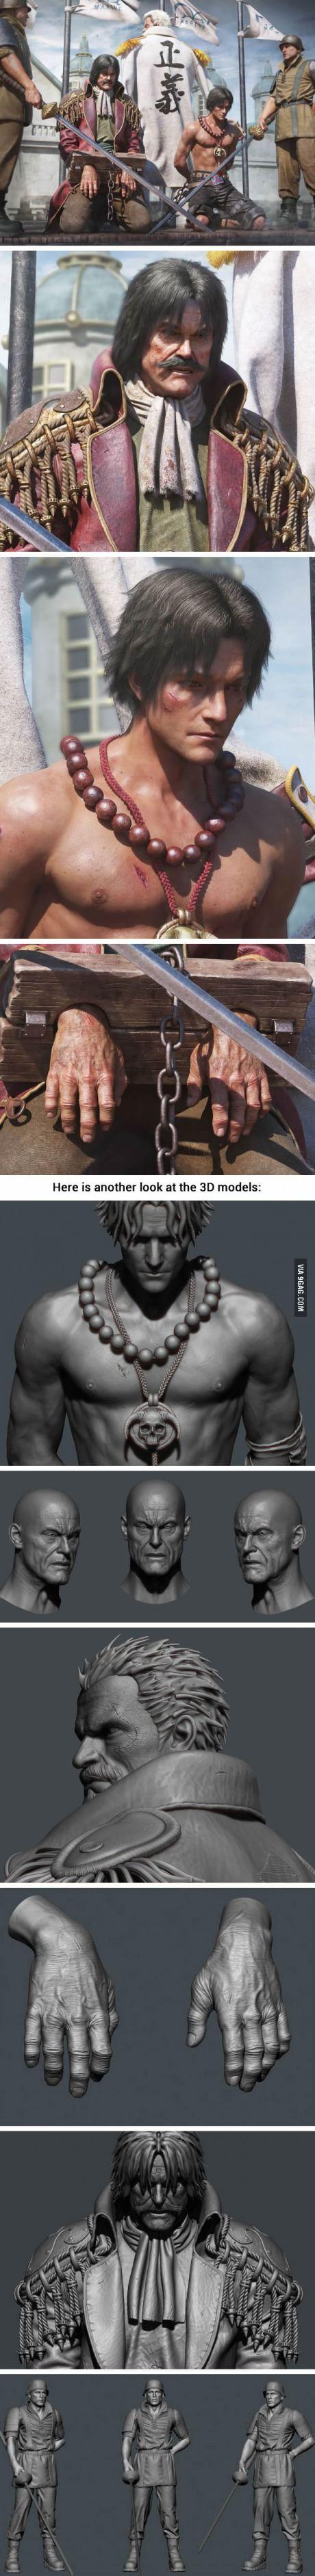 Realistic 3D One Piece Artwork By Chinese Artist Zhong Zhengxiang